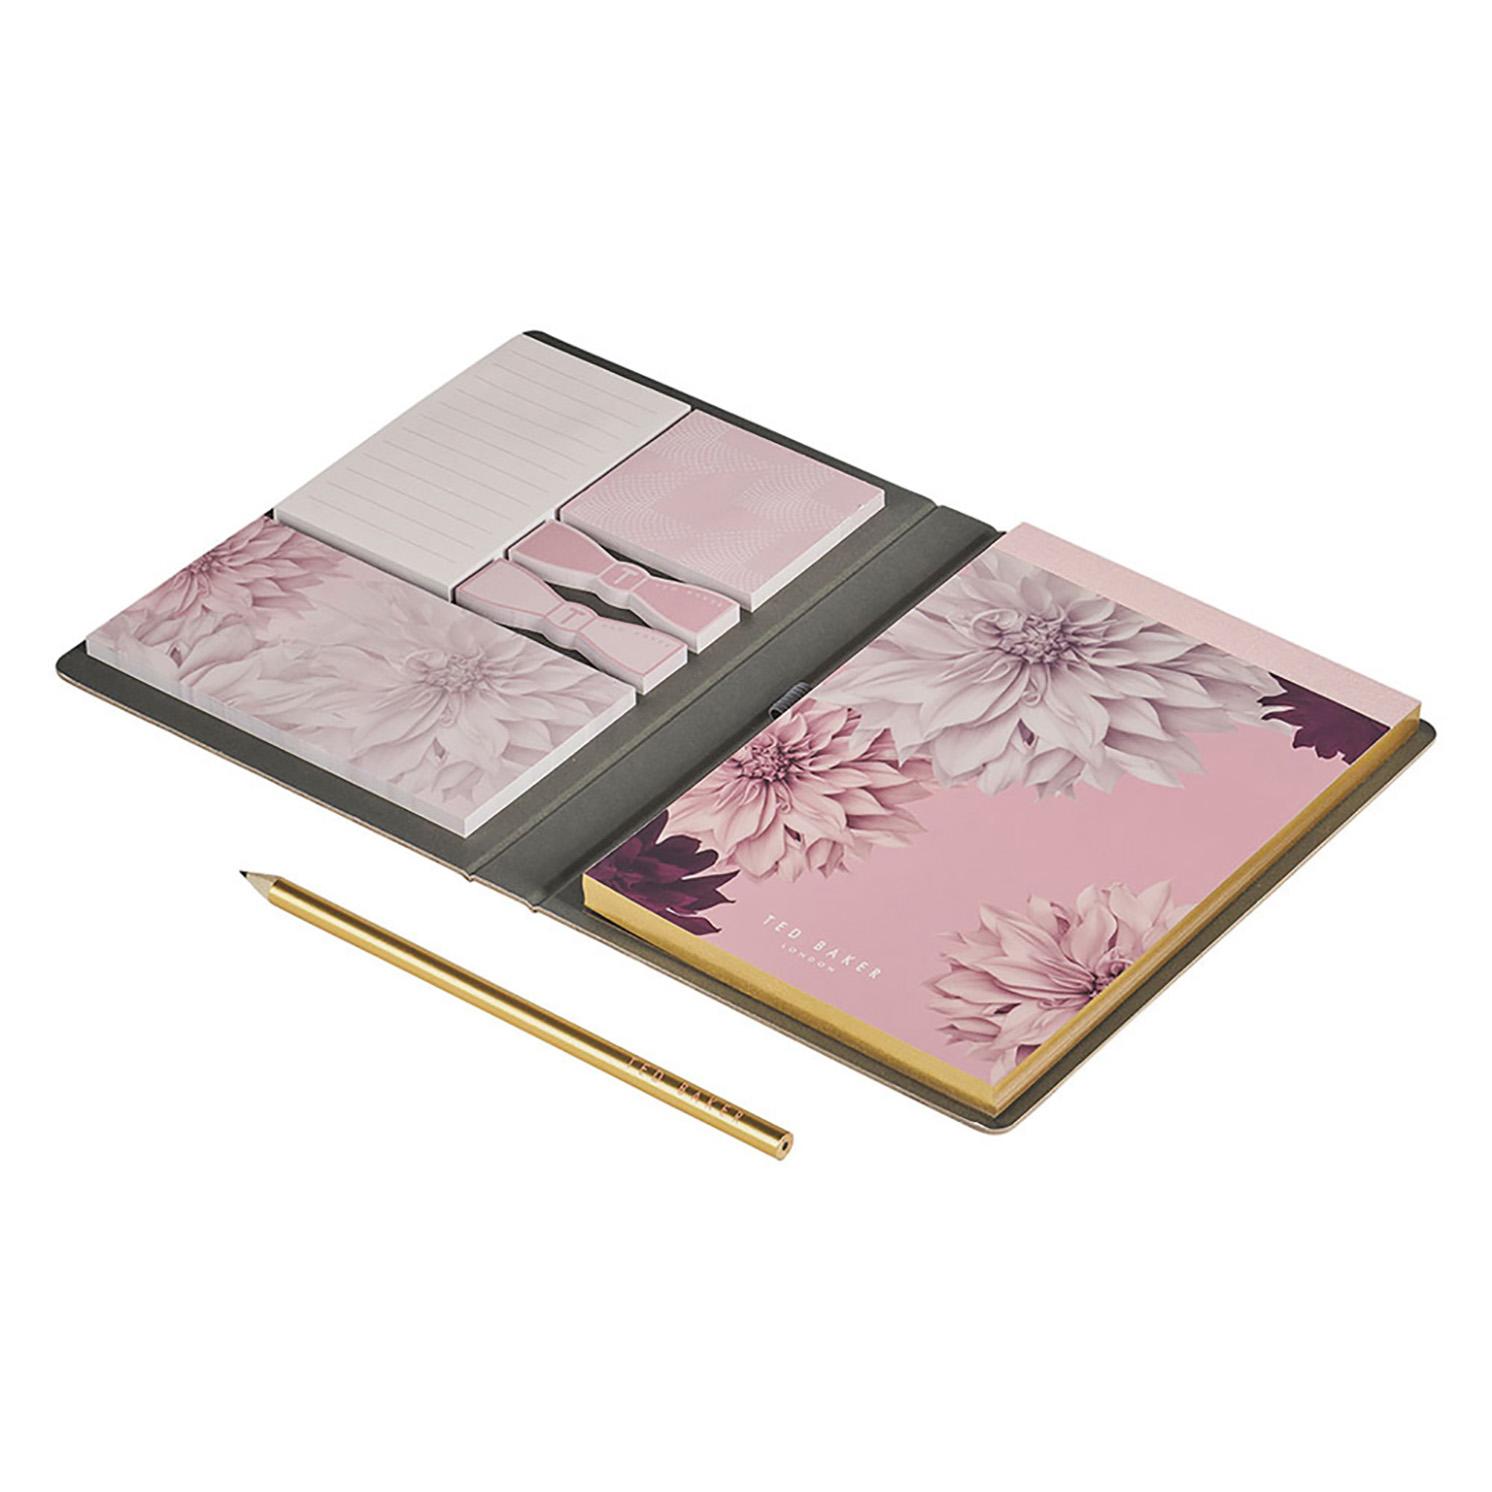 Ted Baker – Pink Clove A5 Hardback Printed Notebook, Pencil & Sticky Notes Set